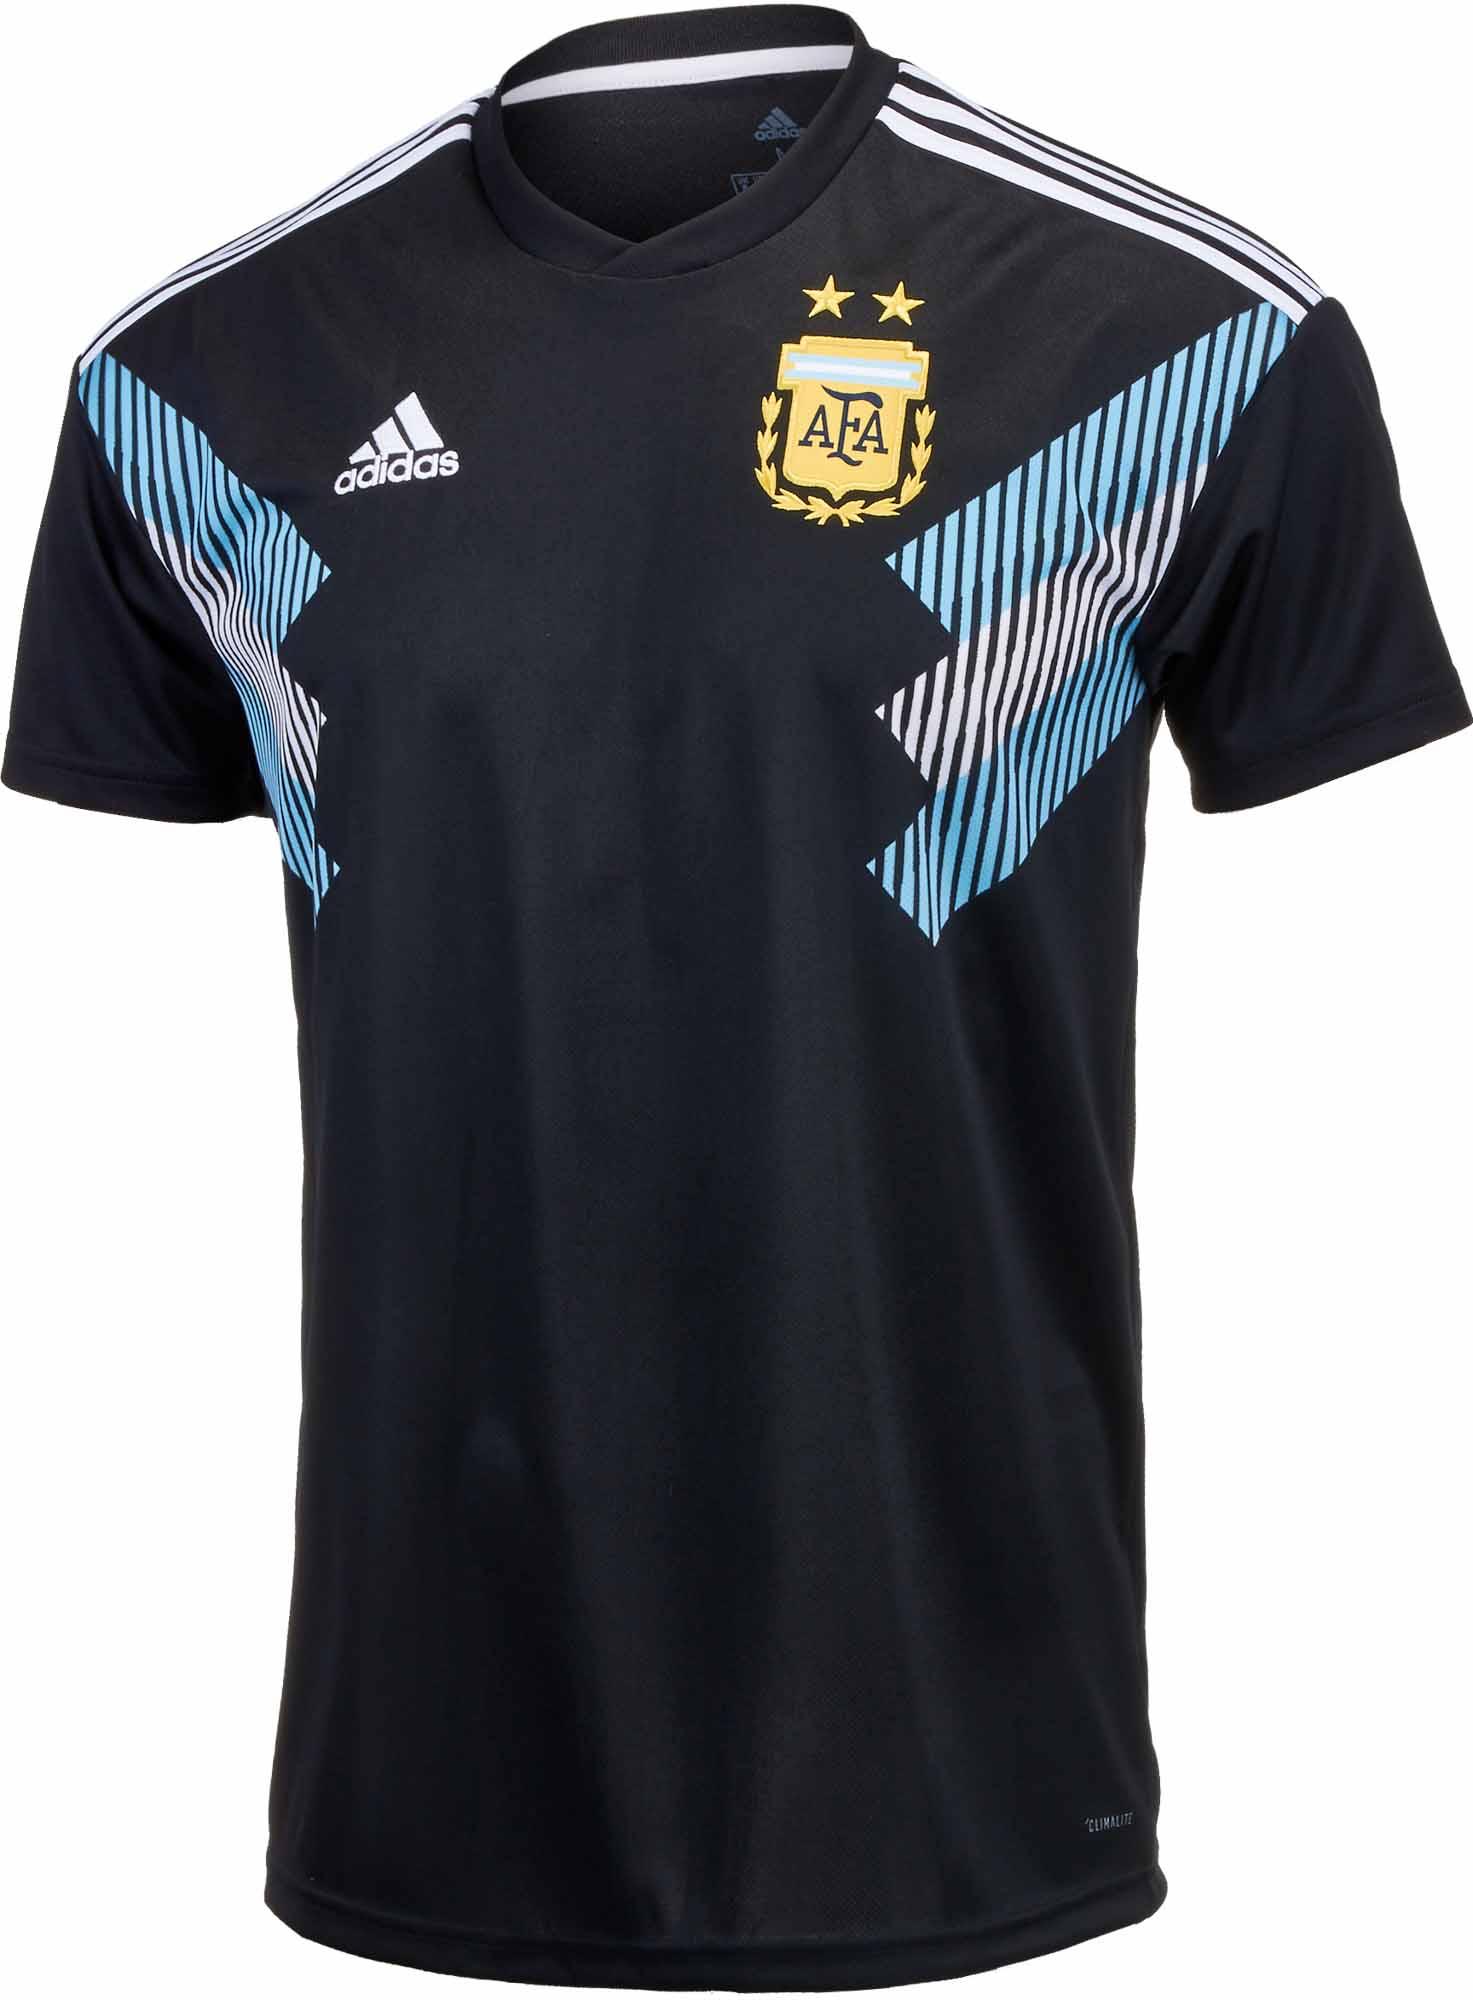 Adidas argentina away jersey 2018 19 Soccer Master